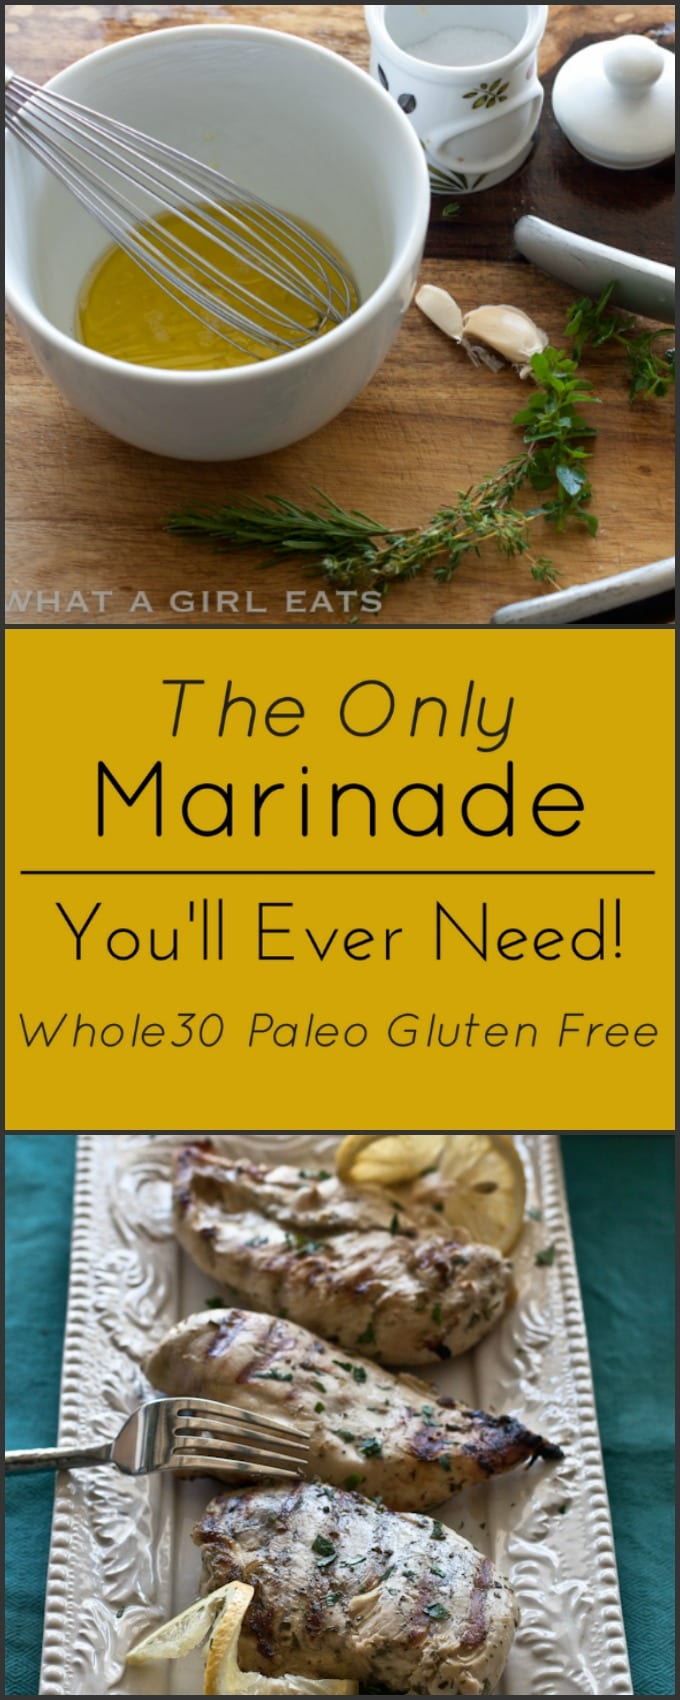 marinade whole30 gluten free